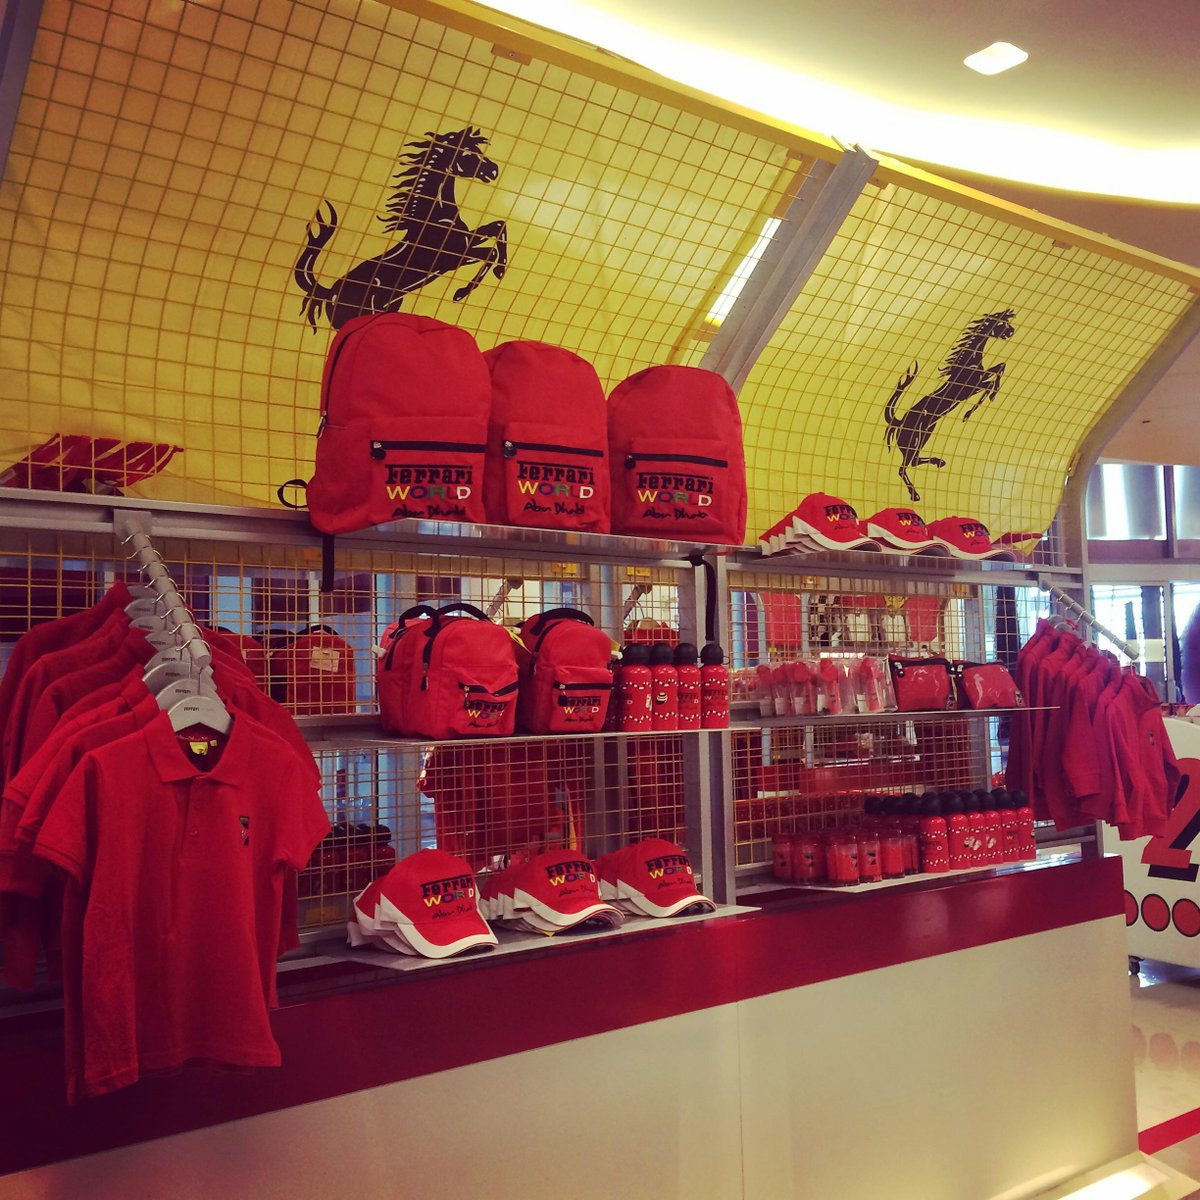 Ferrari World On Twitter Treat Your Kids To The Coolest School - Easily coolest school world